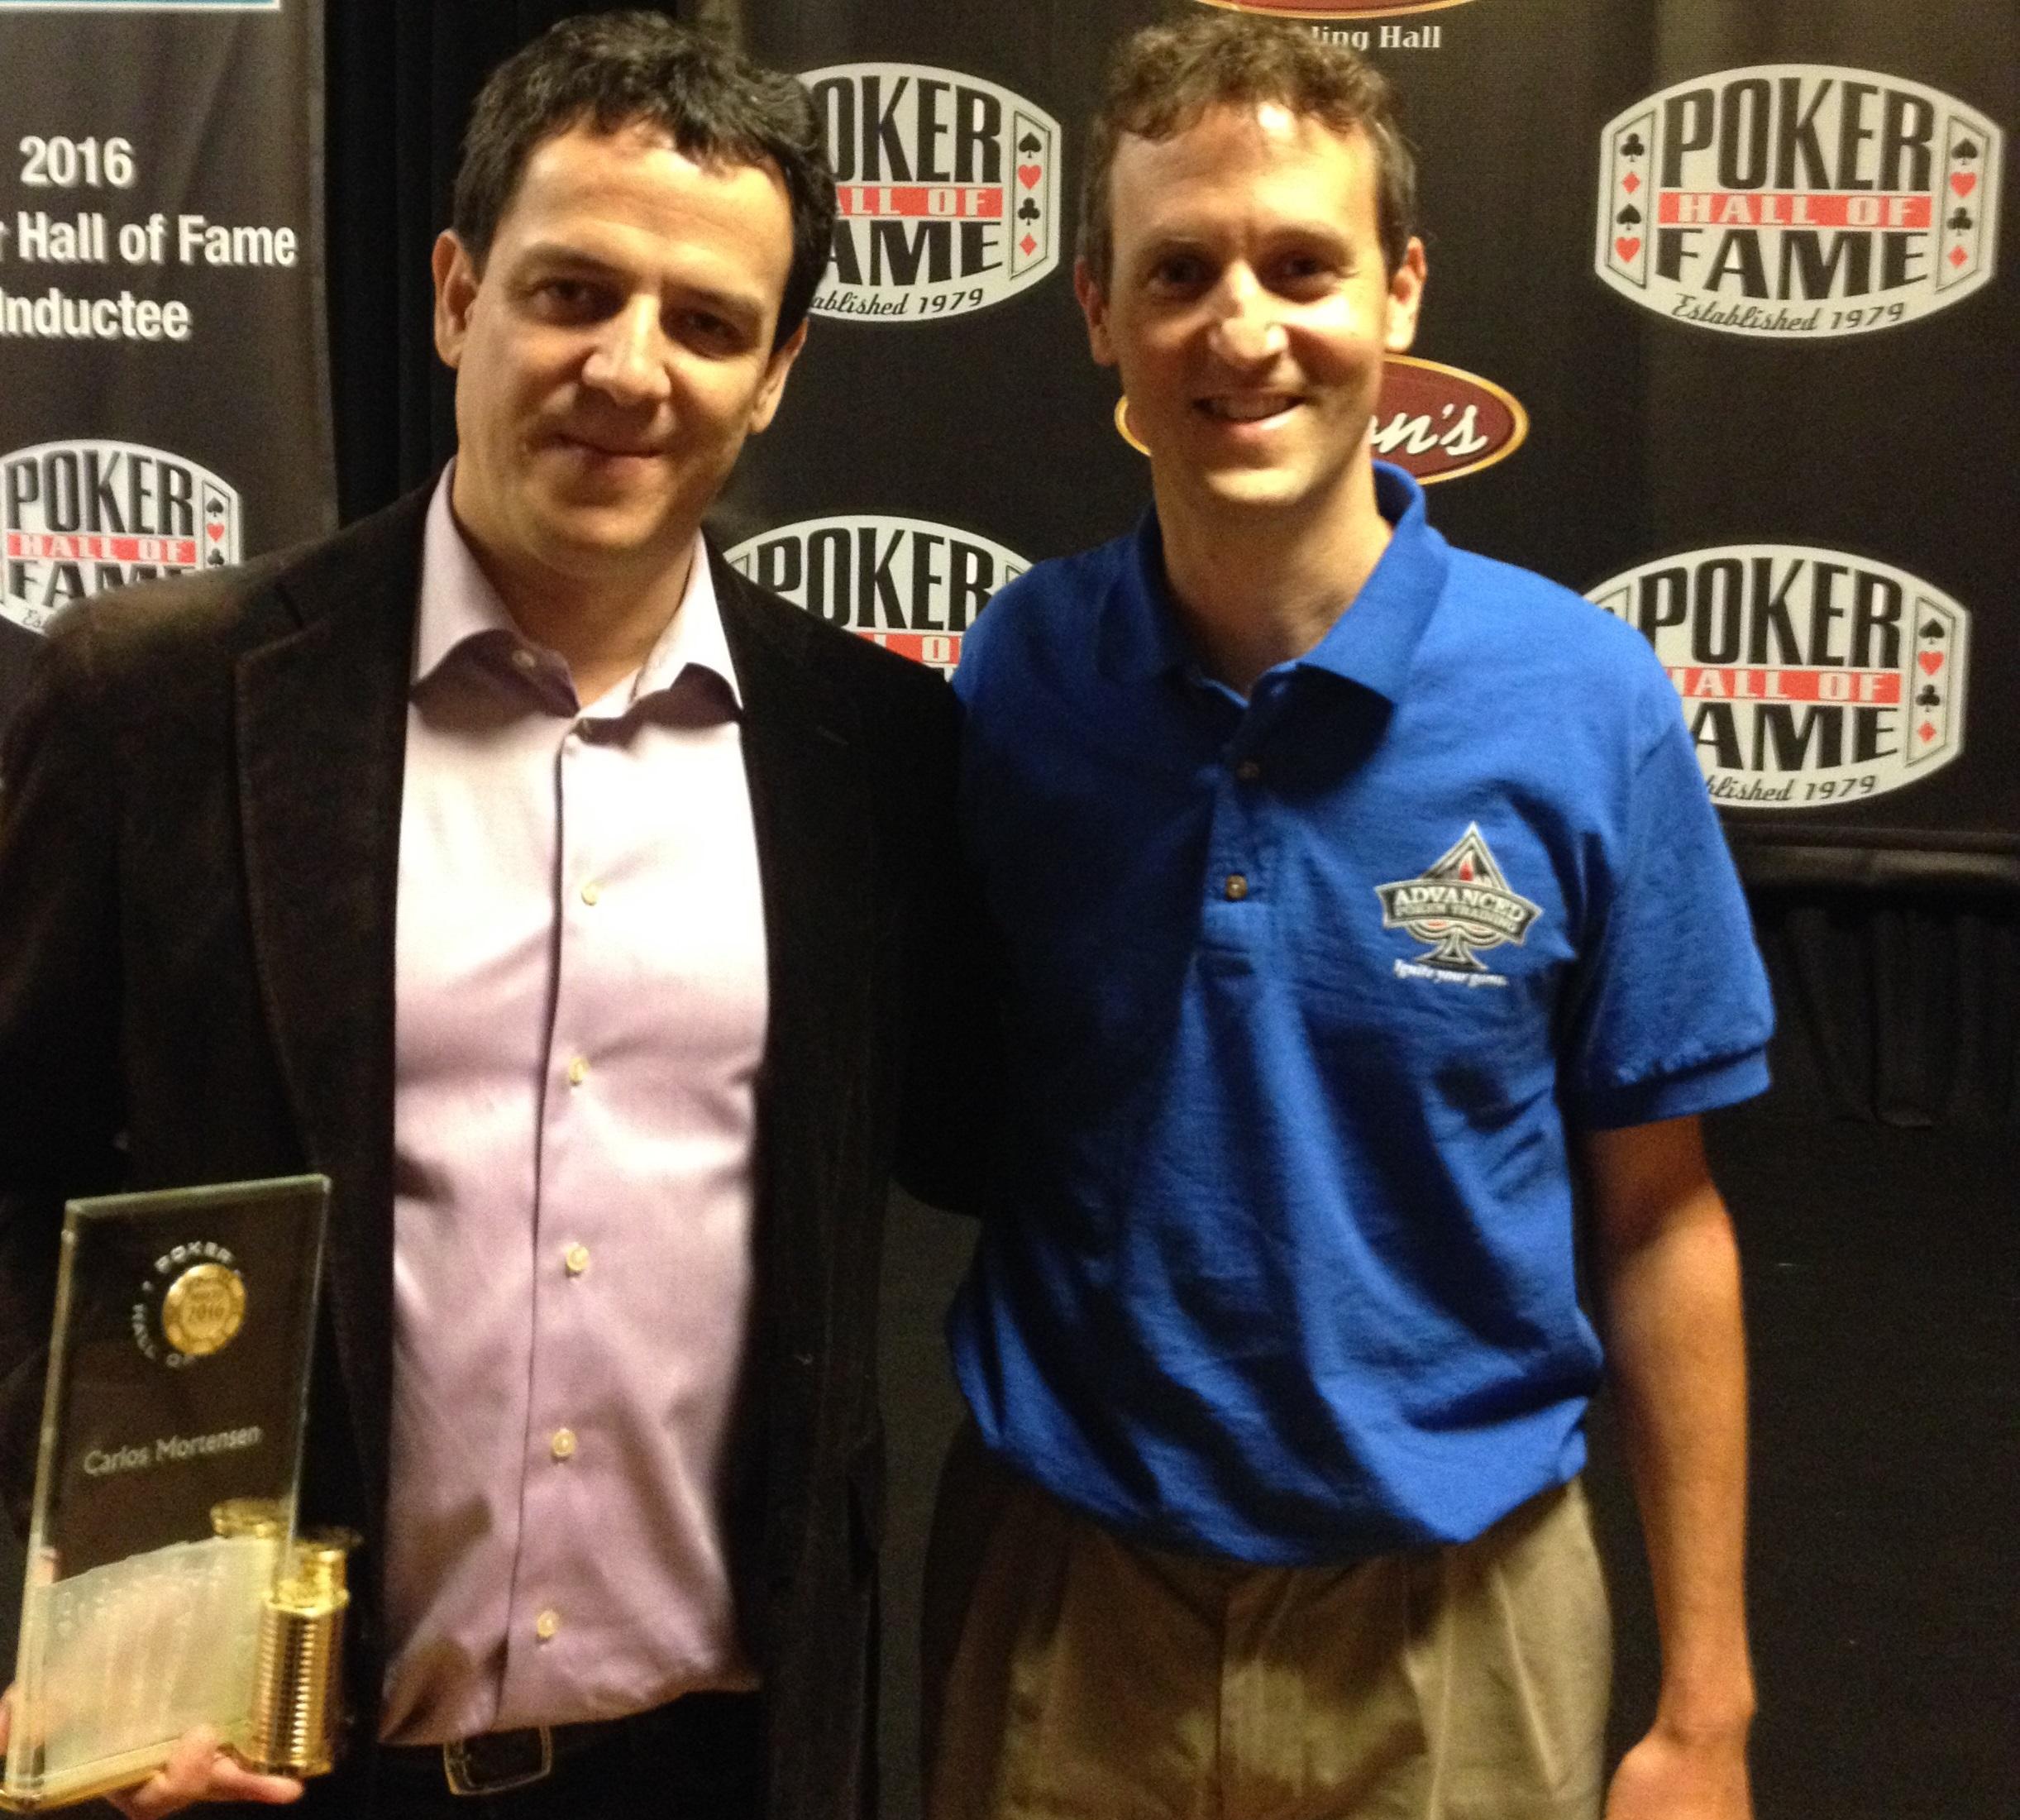 Carlos Mortensen, WSOP Hall of Fame inductee